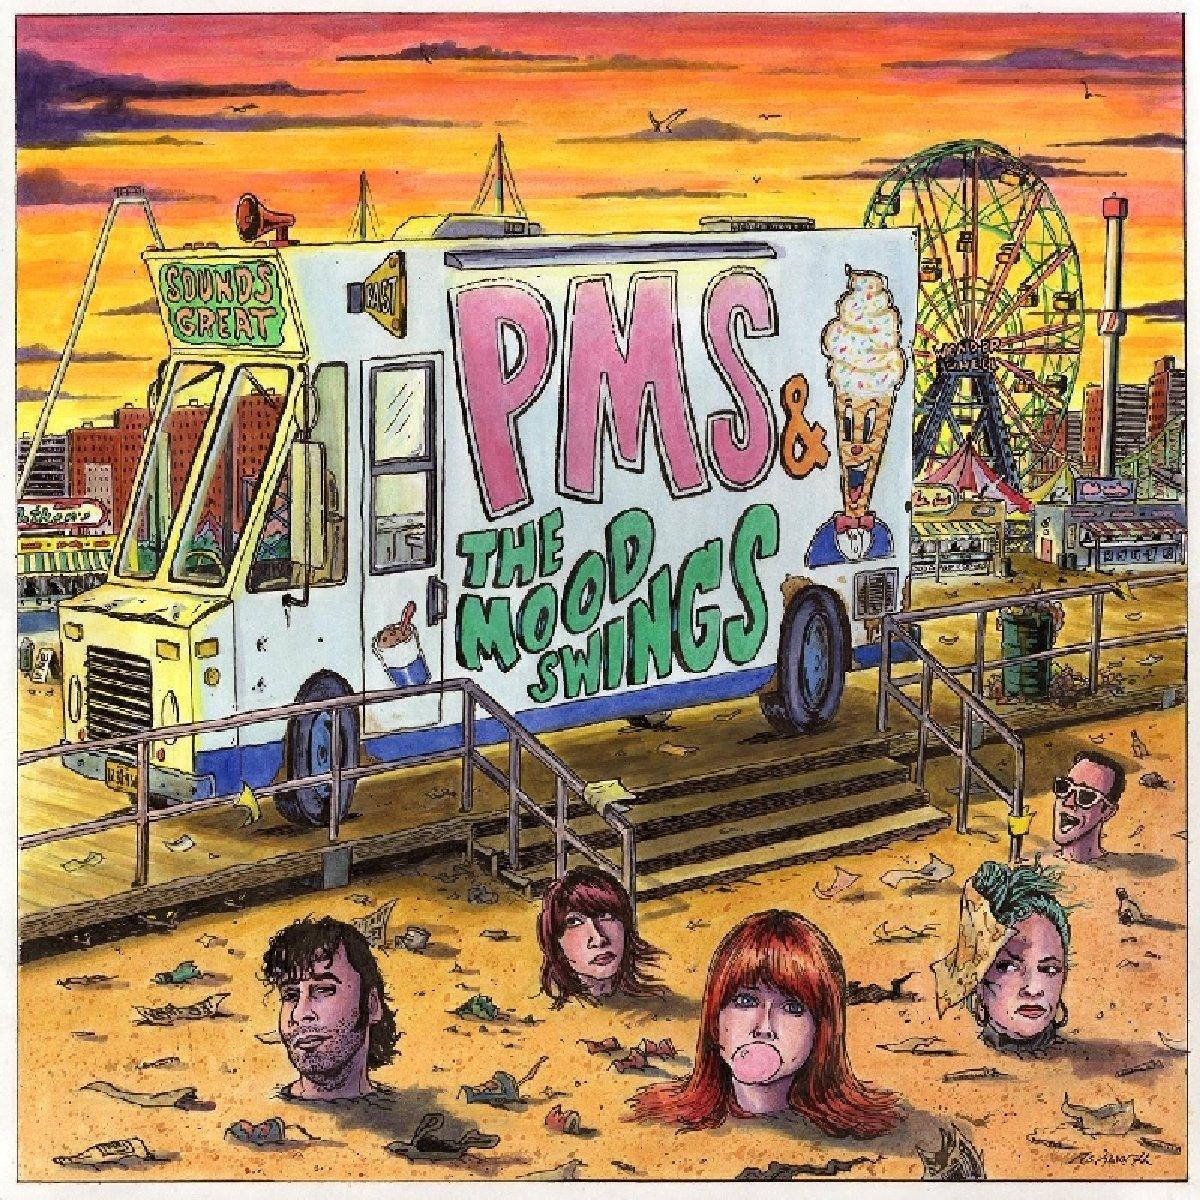 Vinilo : Pms & the Moodswings - Pms & The Moodswings (Digital Download Card)